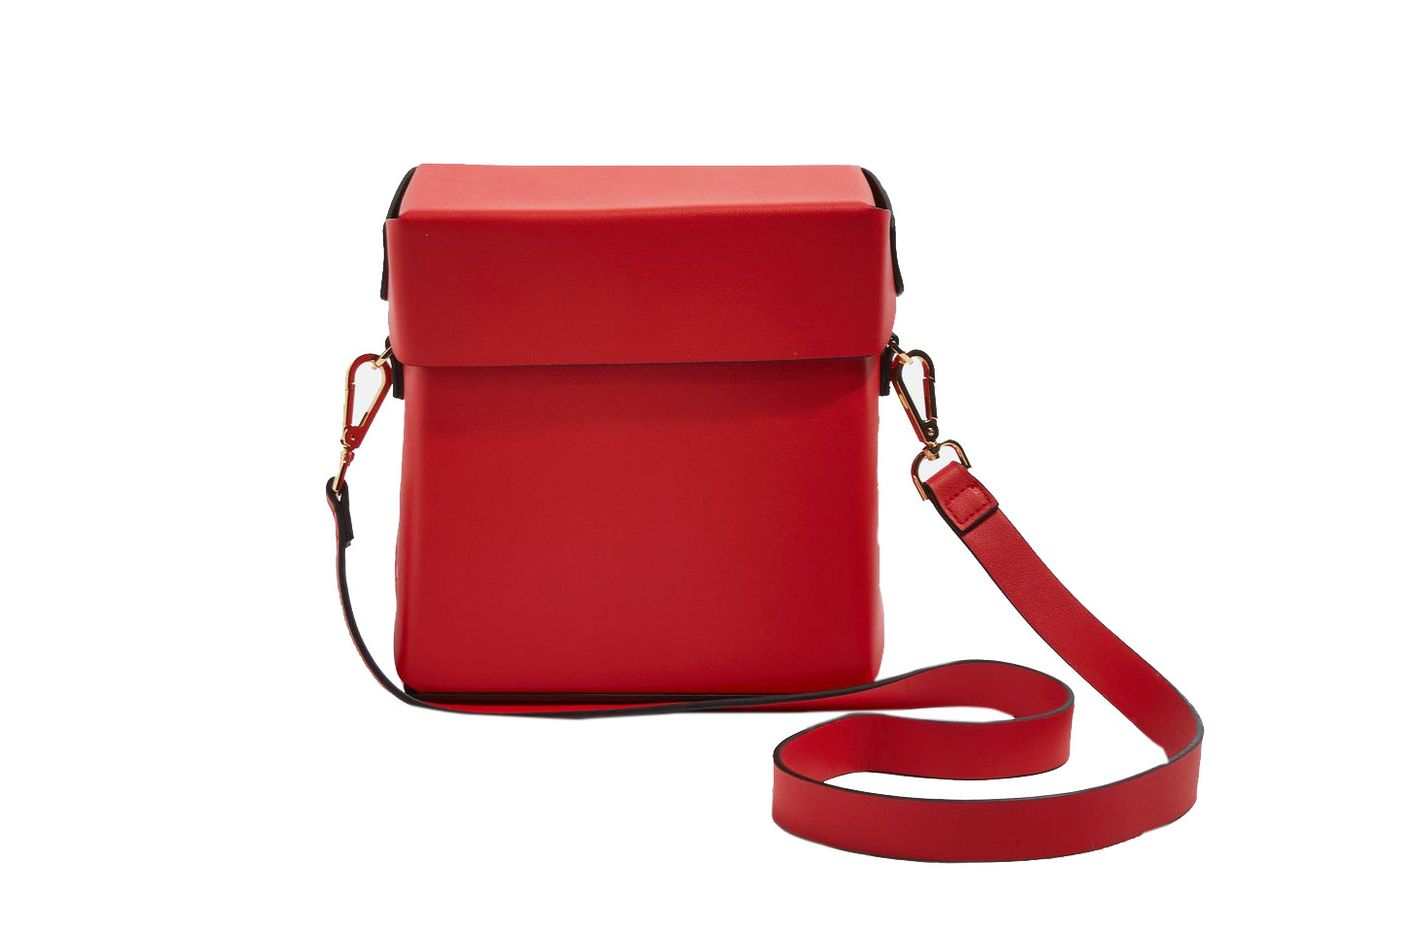 Amaze Boxy Shoulder Bag